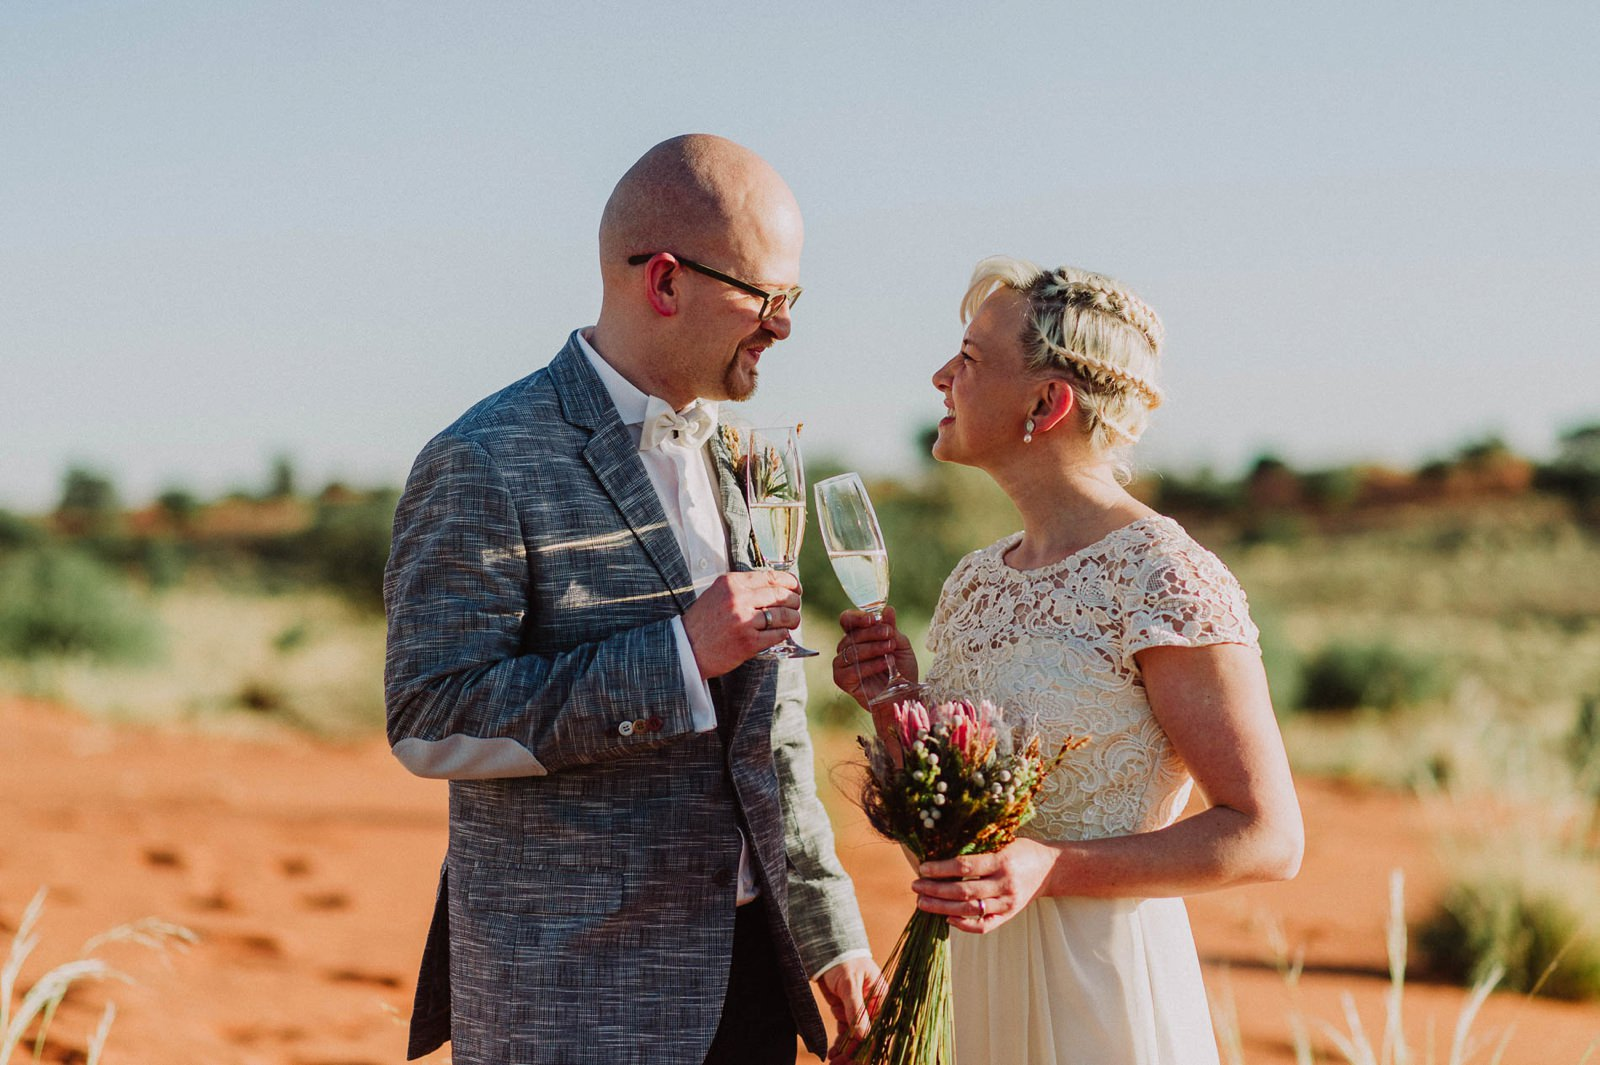 heiraten-in-namibia-6194.jpg